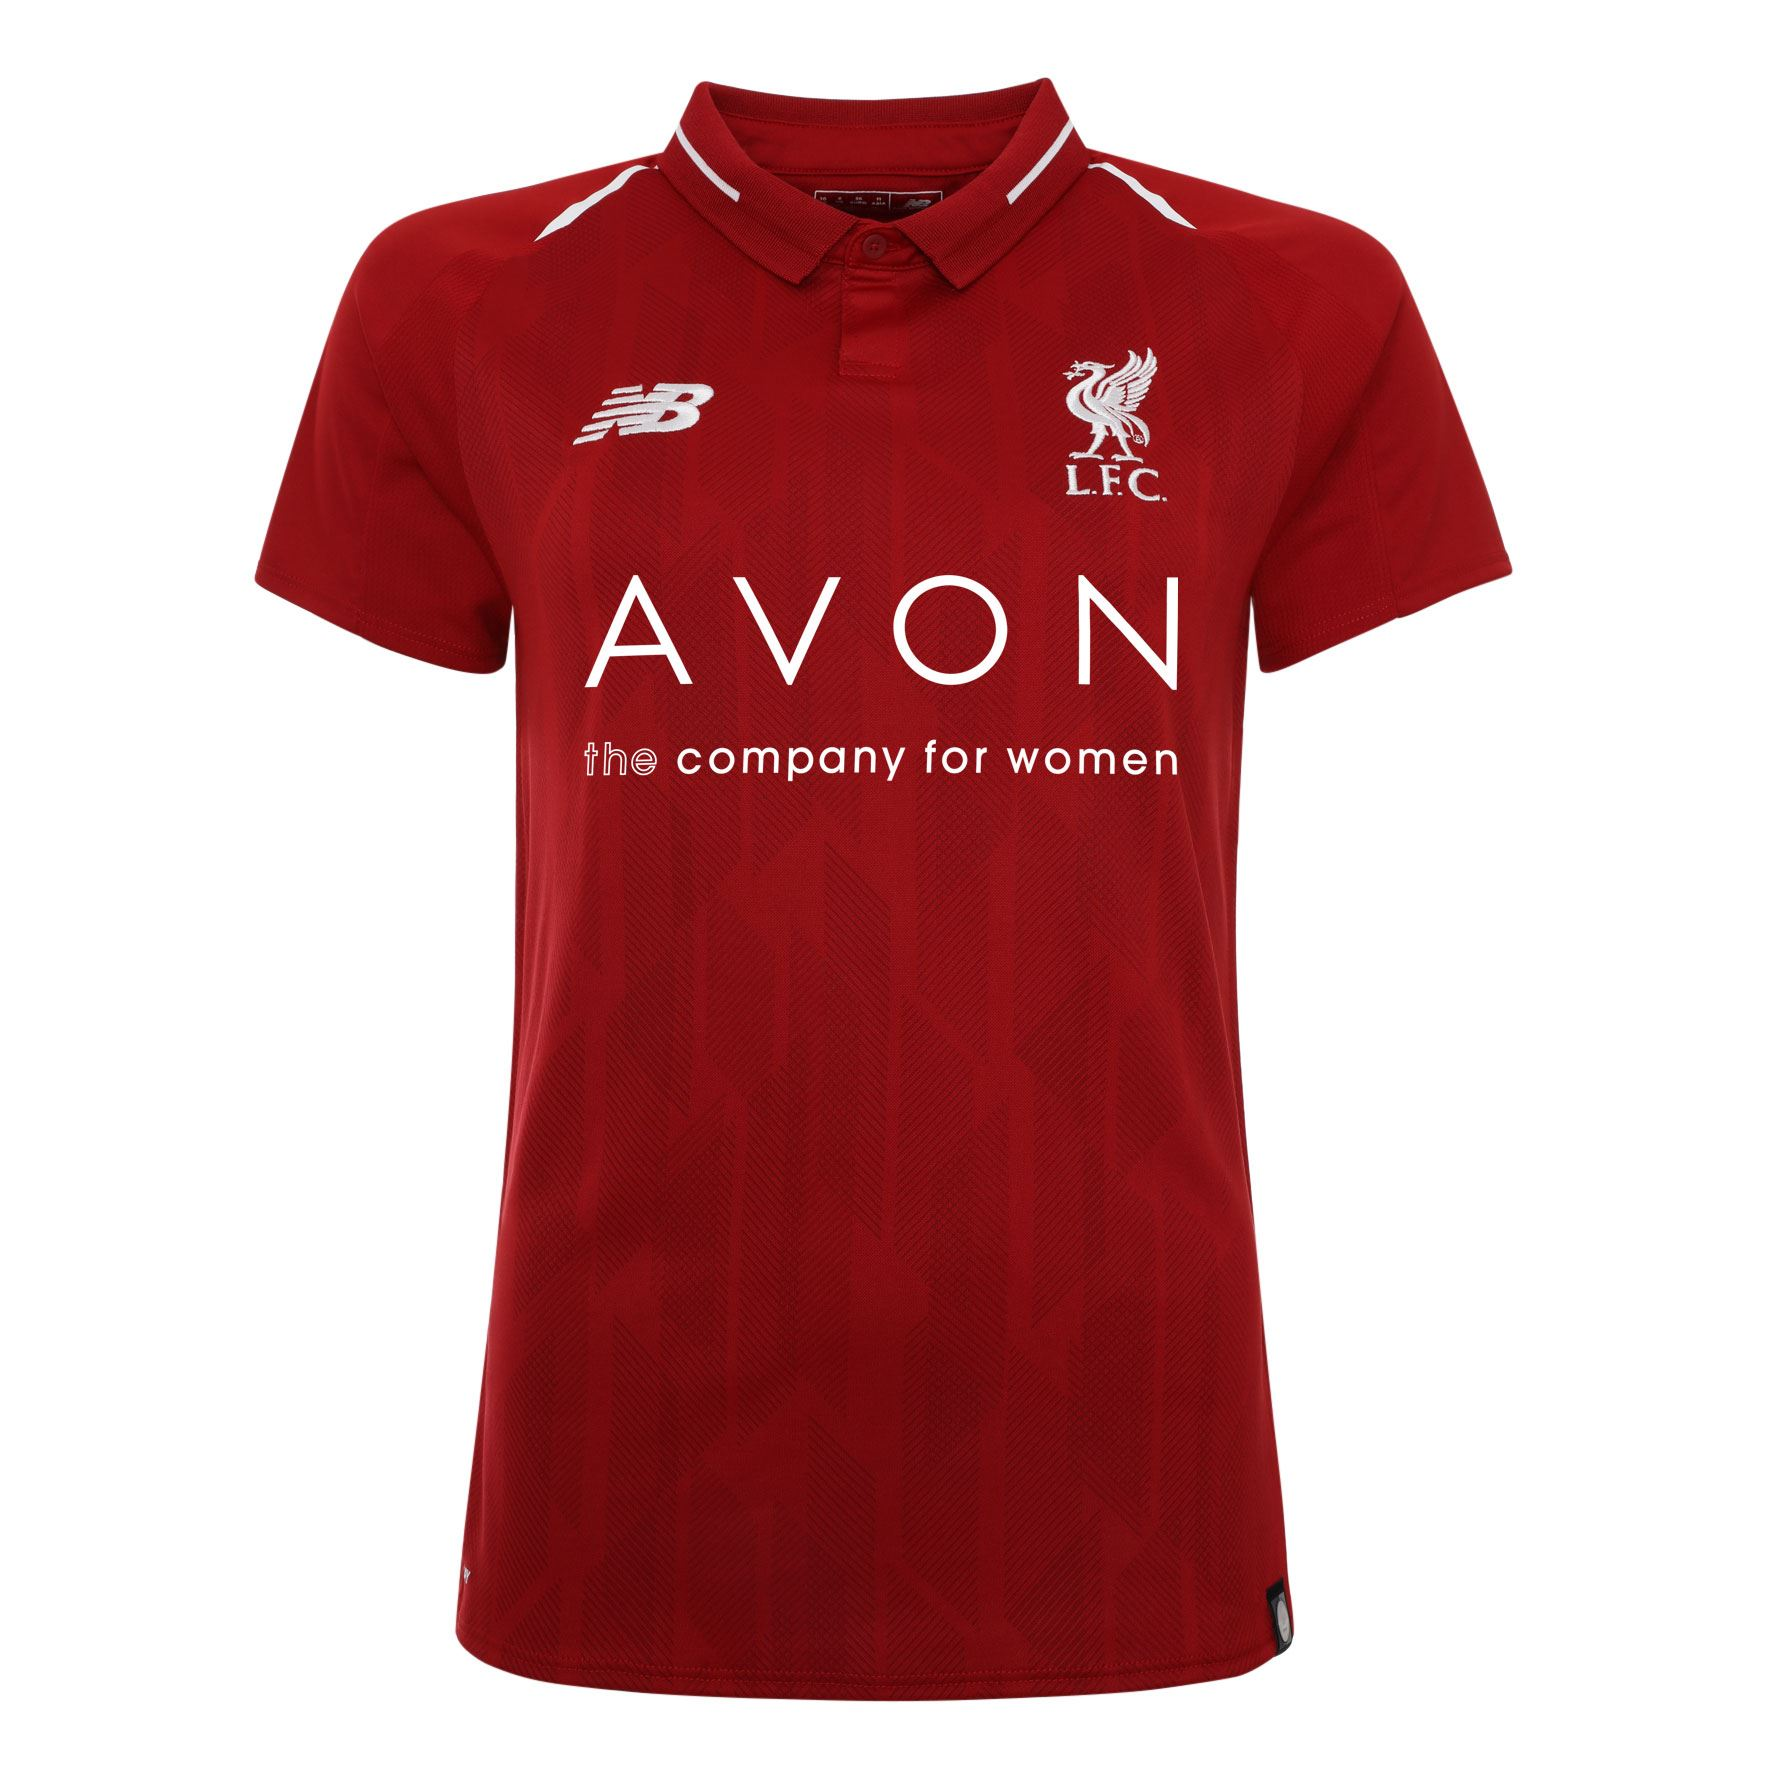 Details about FC Liverpool Home Kit Red Womens Avon Soccer Shirt 18 19 LFC  Official 50052da5b